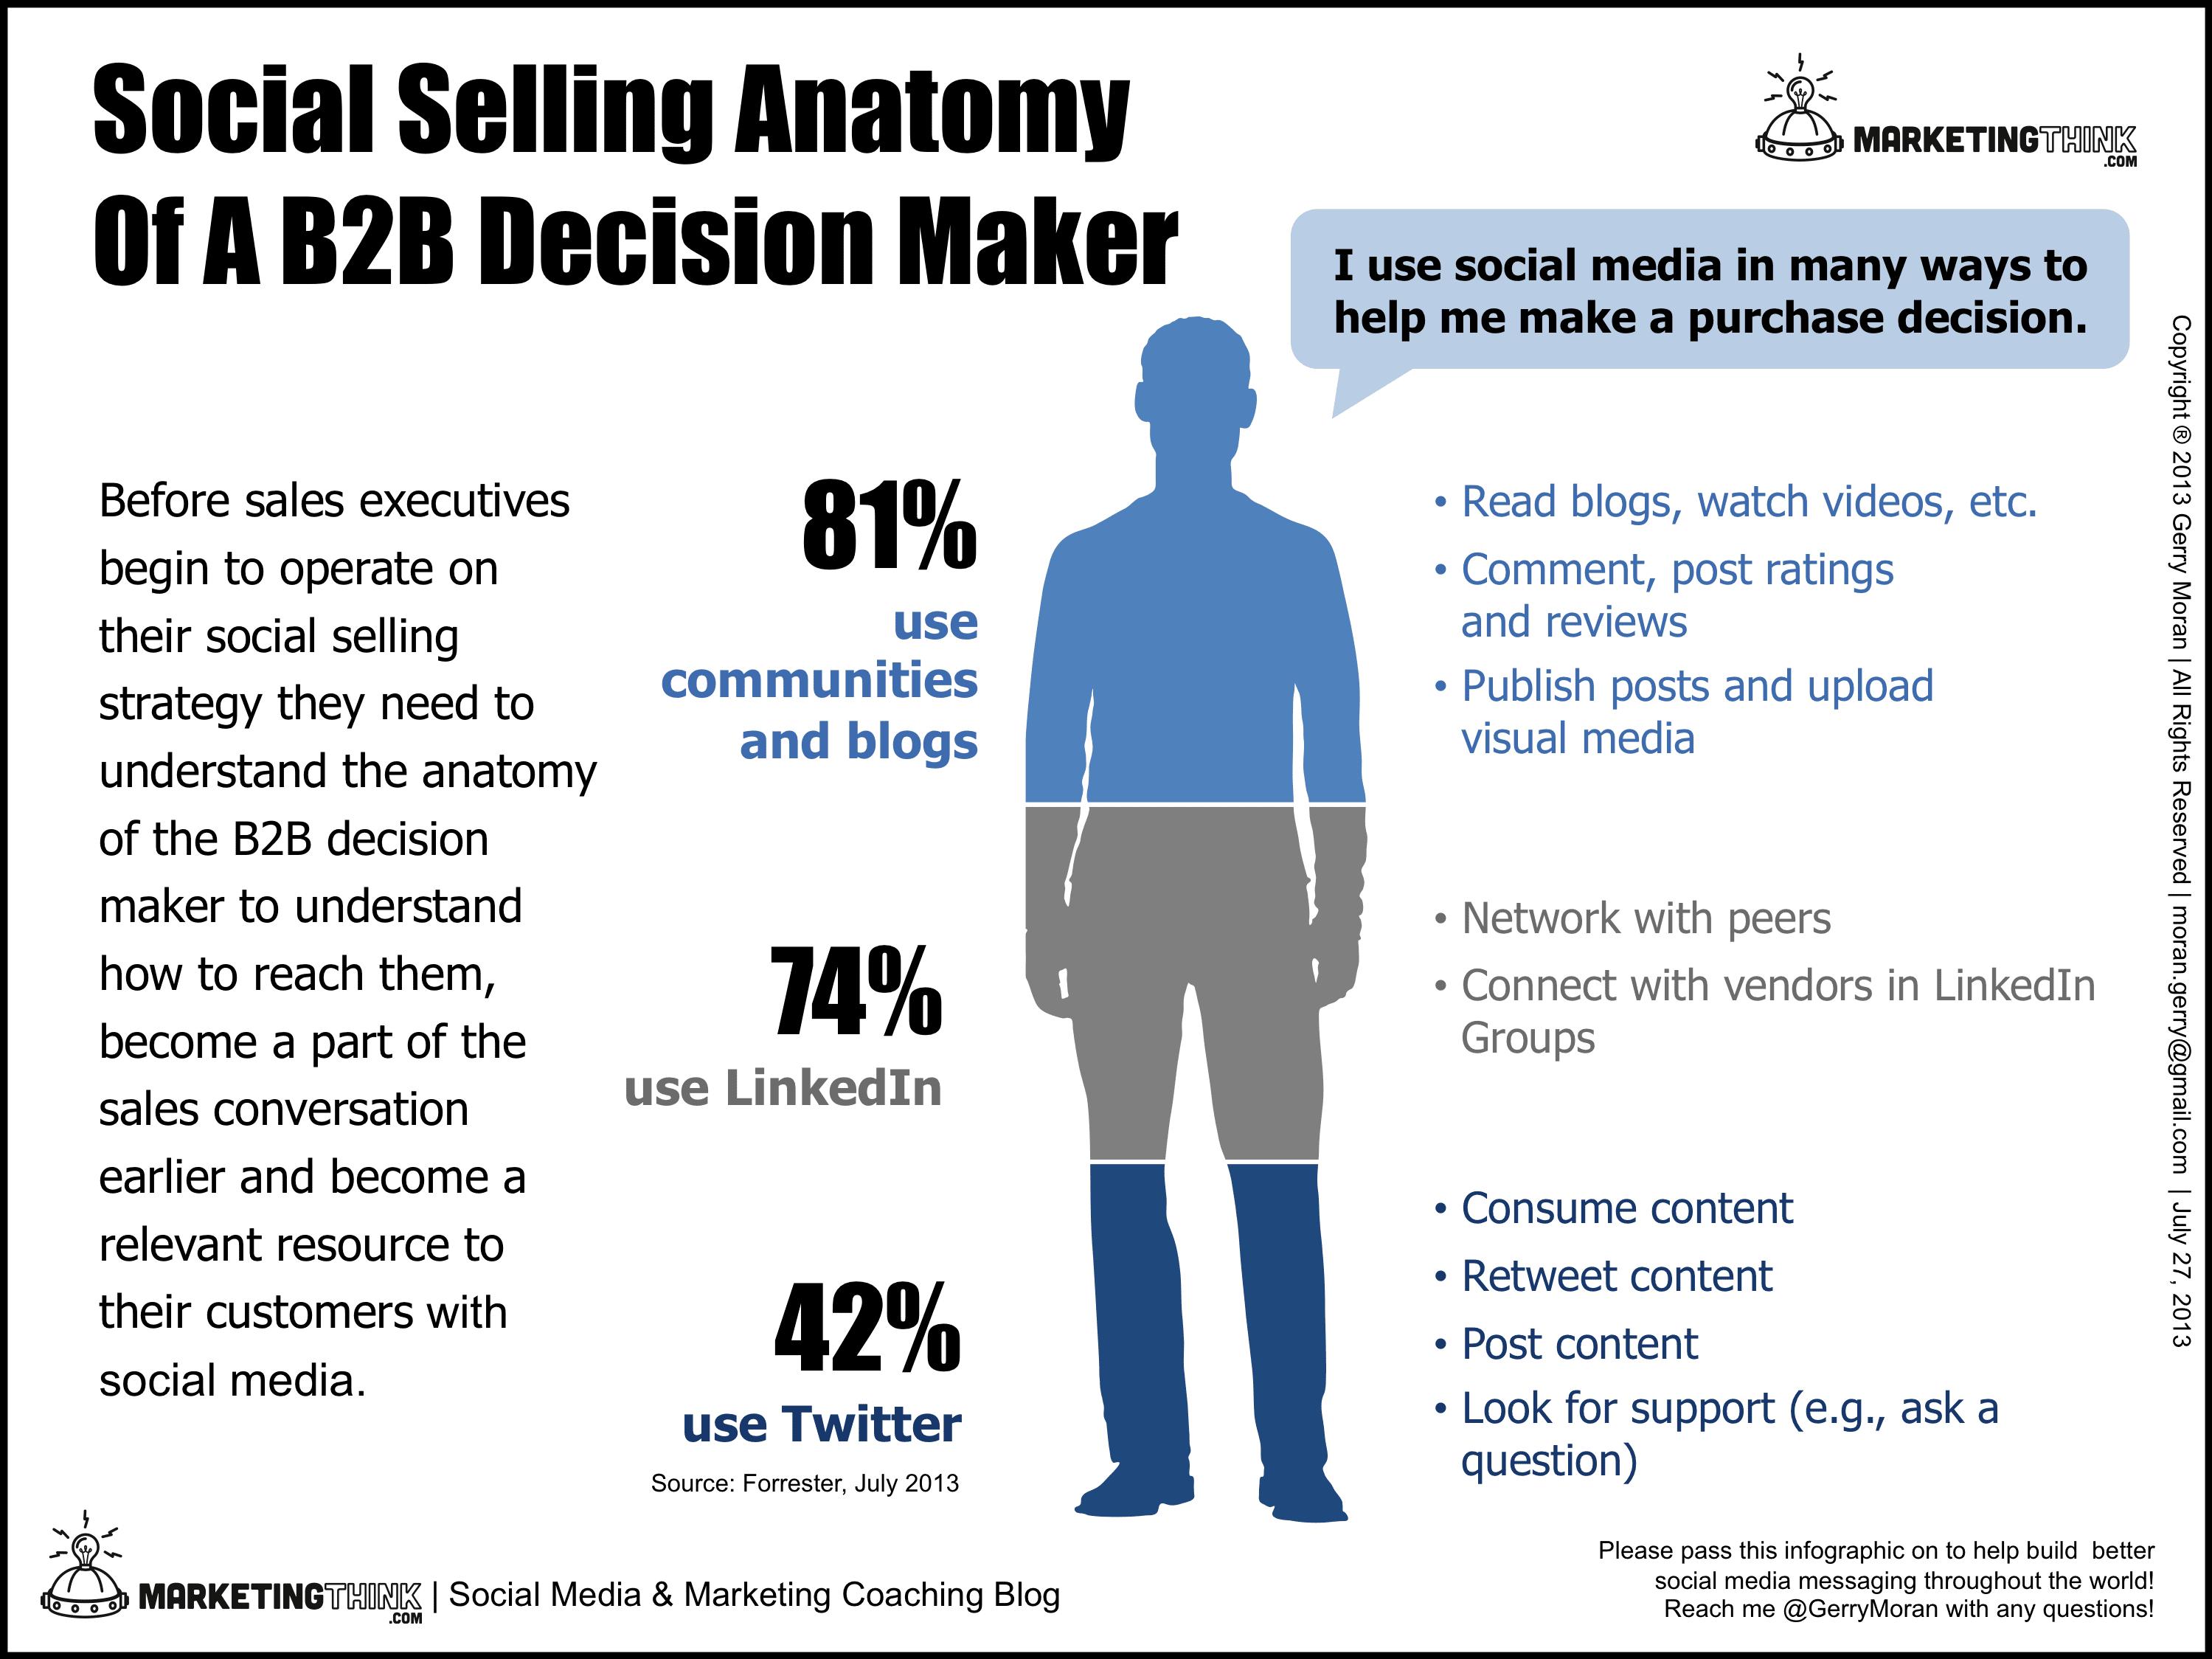 Social Selling Anatomy Of A B2B Decision Maker